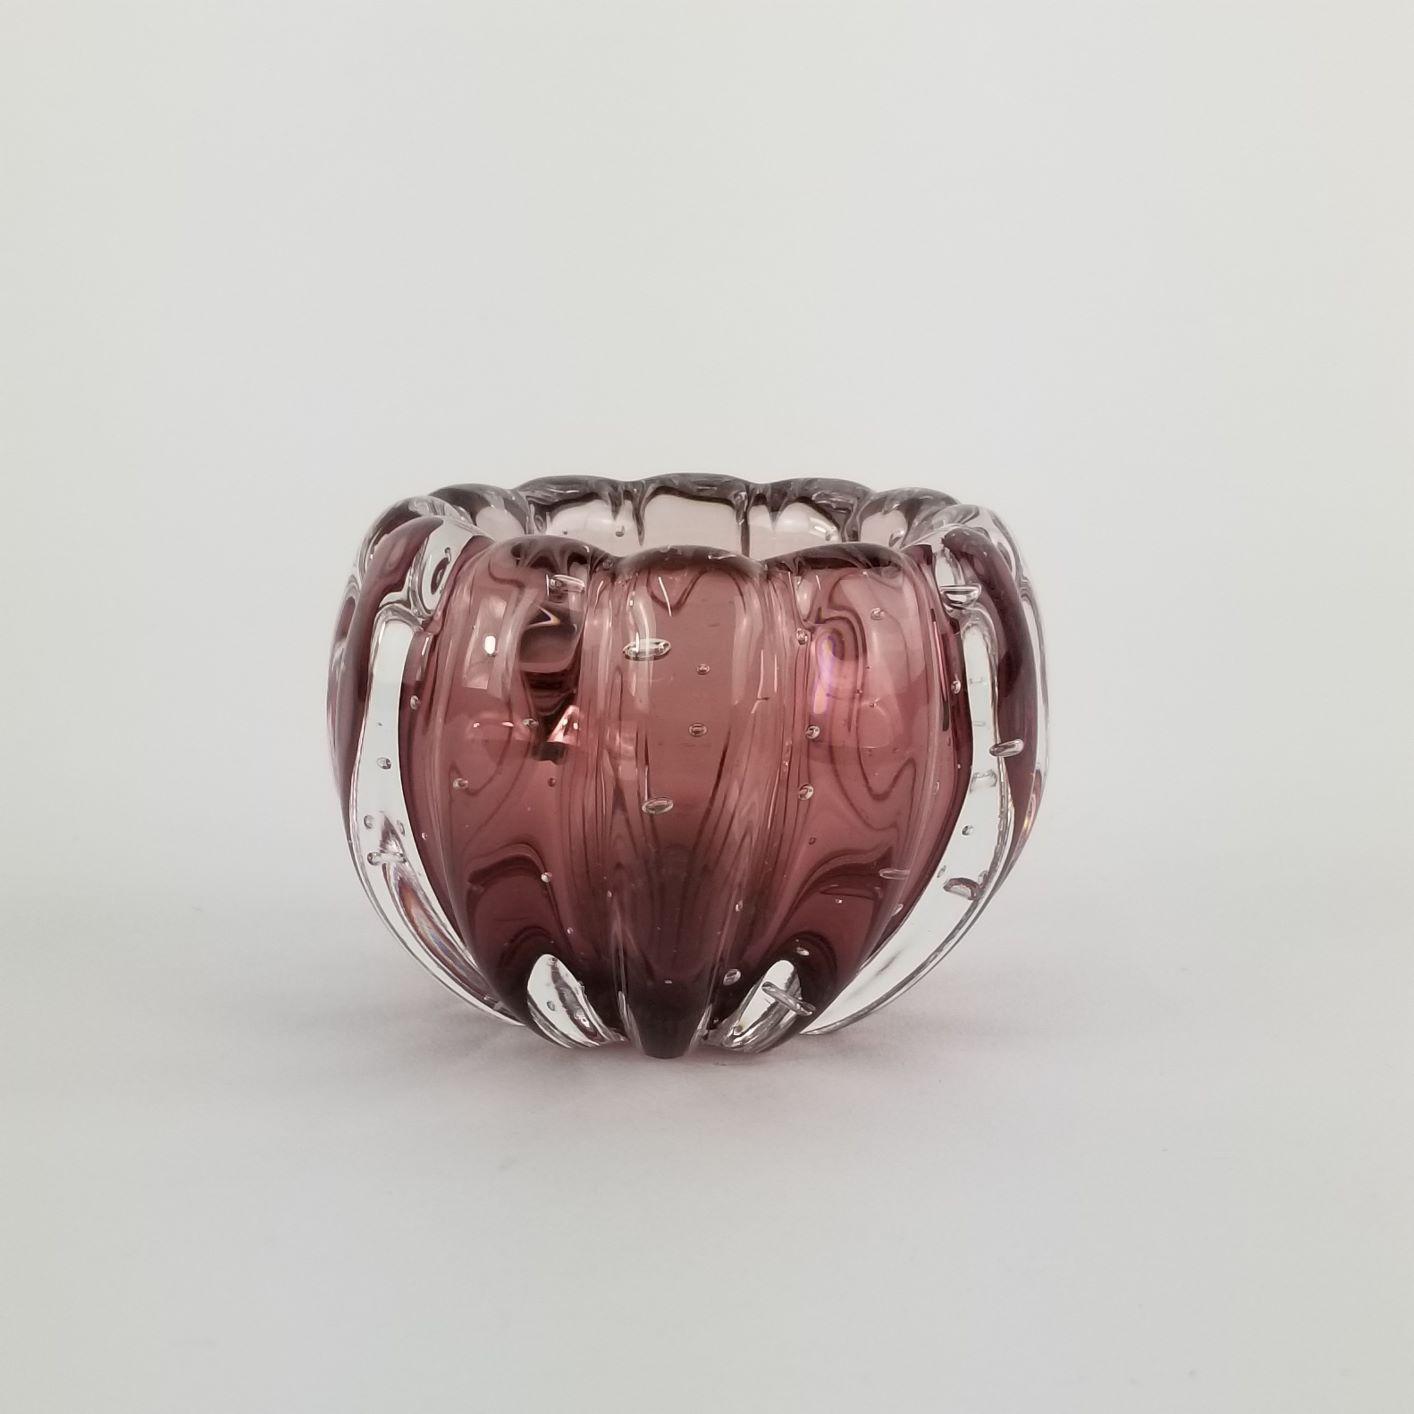 Mini Cachepot De Murano D'Labone - Liceu Cristal New Rubi